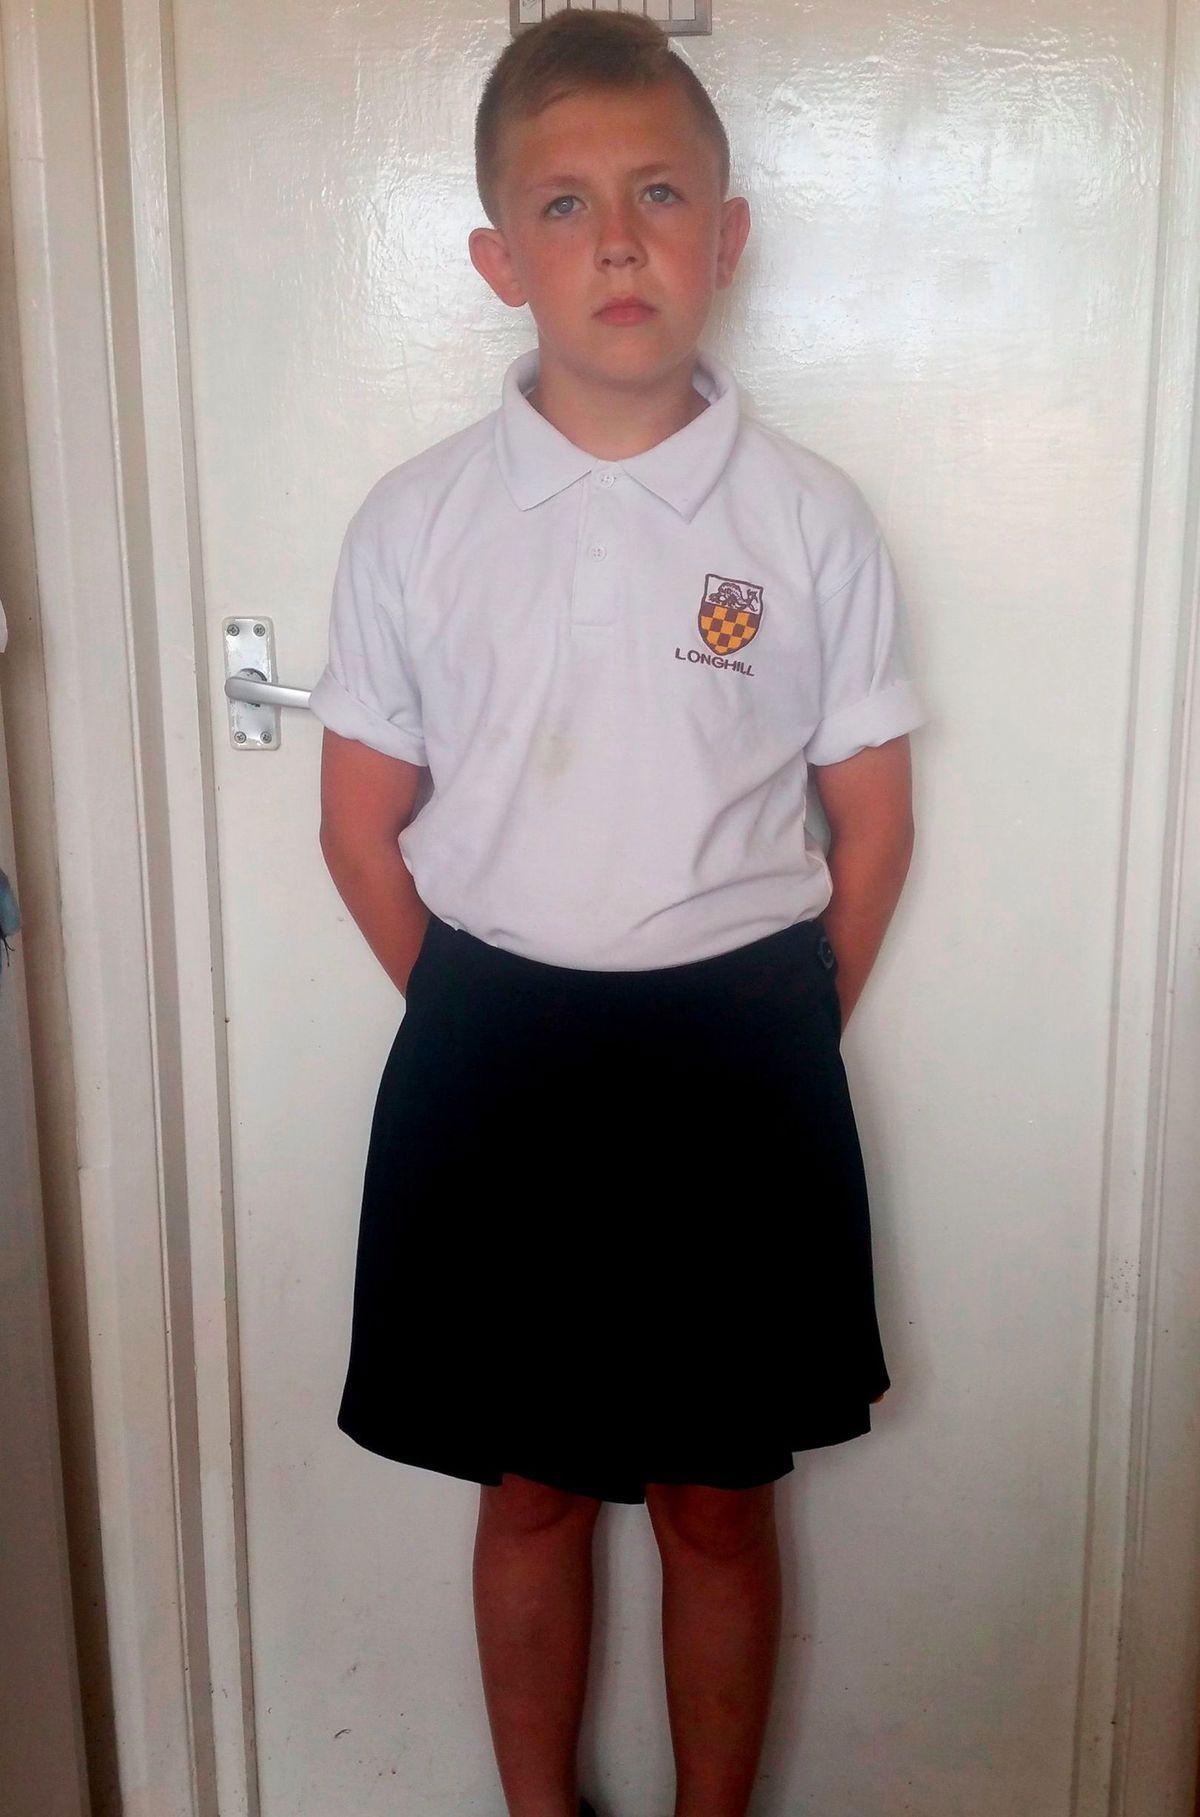 Sissy Boys In Skirts